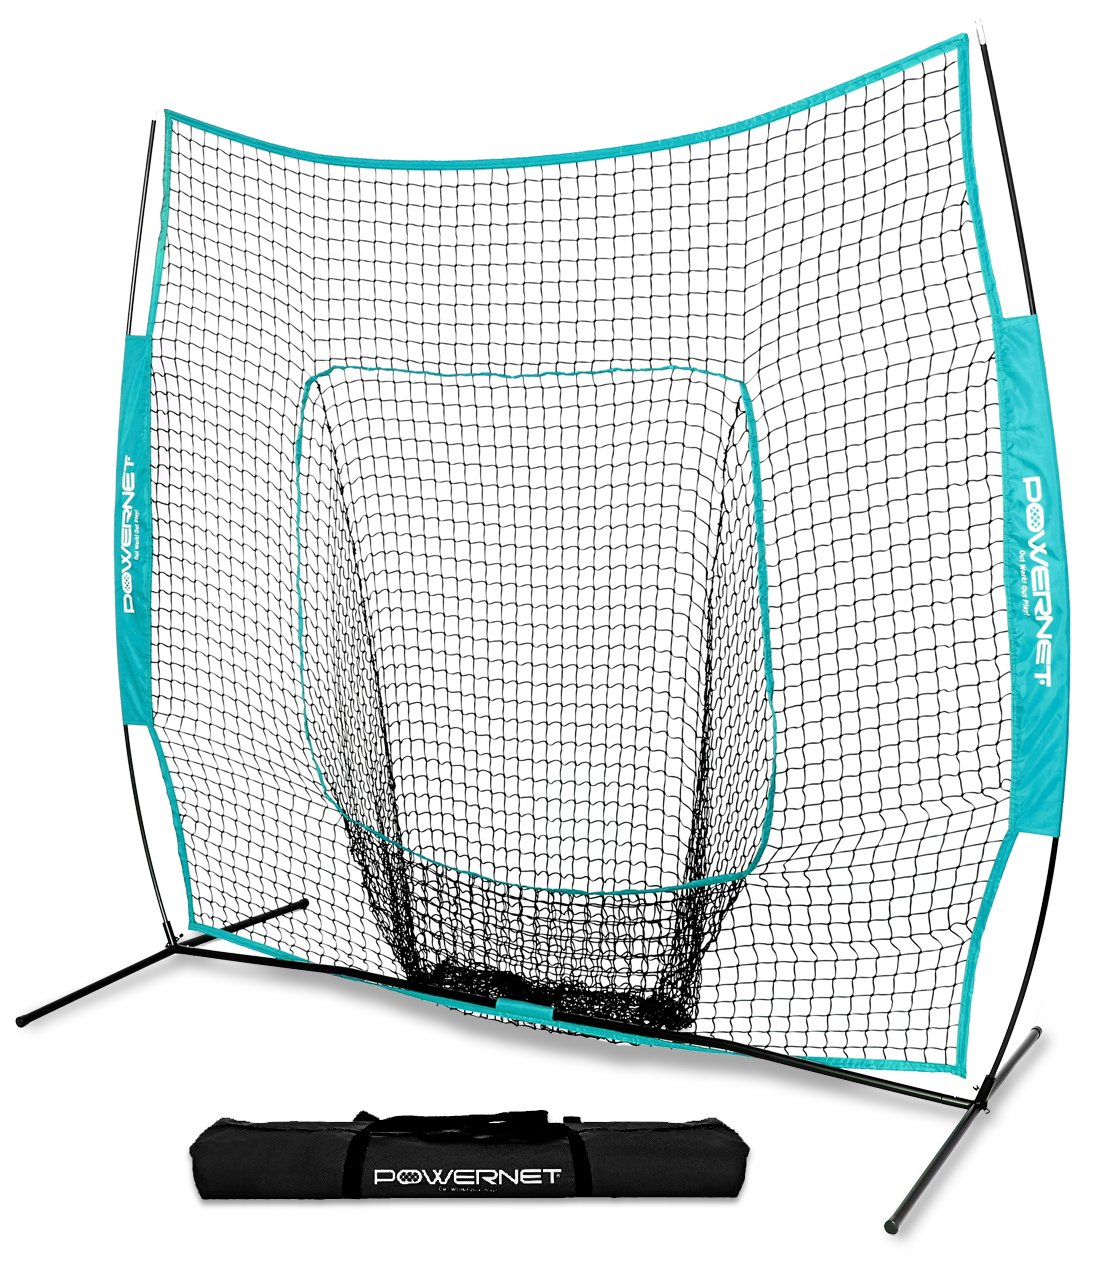 PowerNet Team Color Baseball Softball 7x7 Hitting Net w/Bow Frame (Sky Blue) by PowerNet